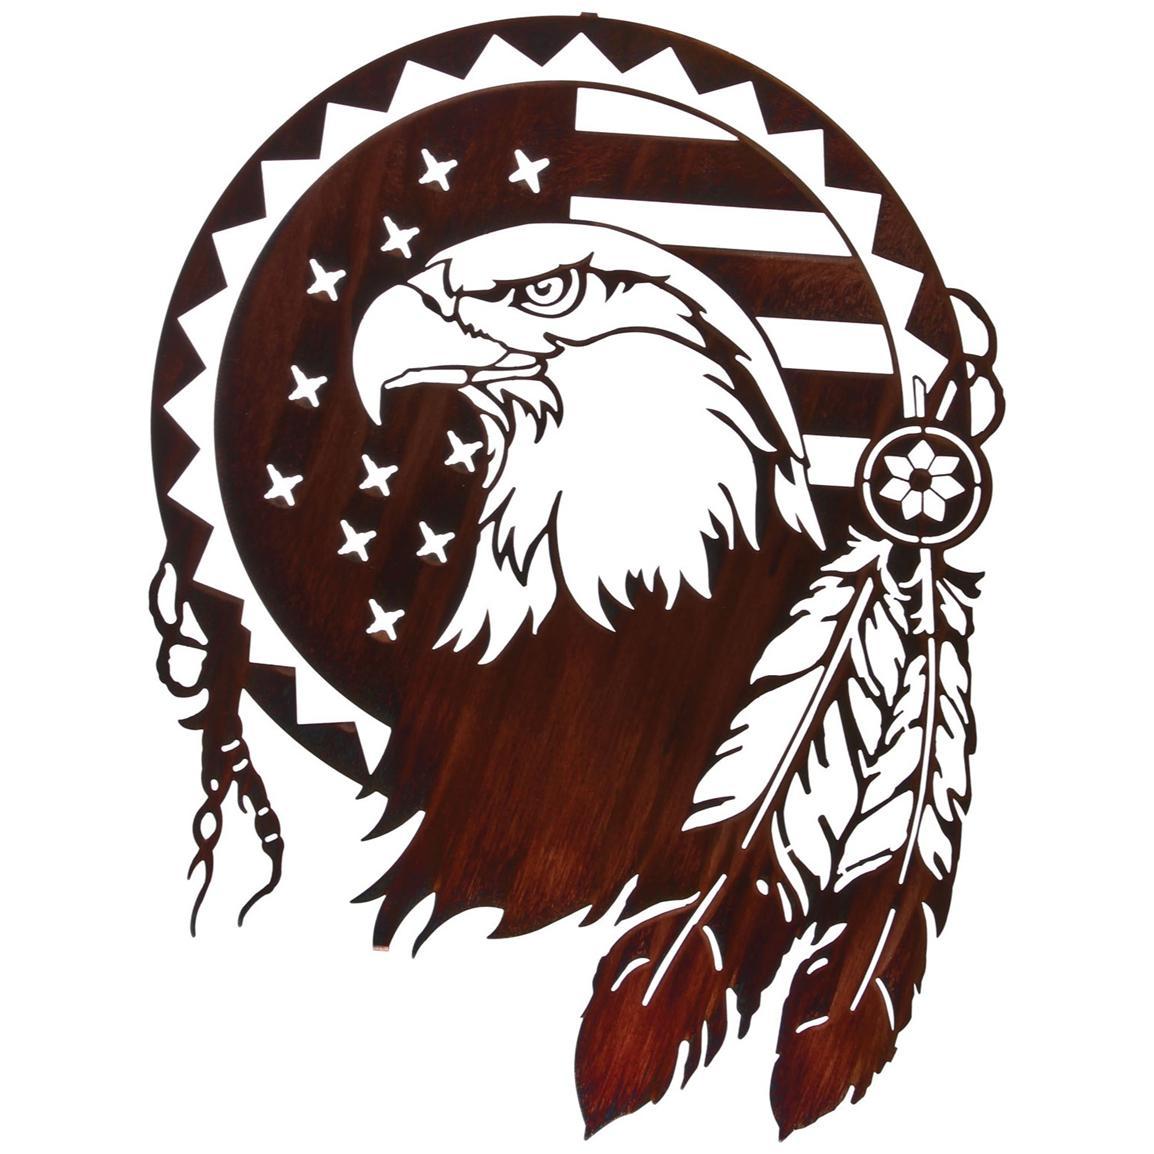 1154x1154 Eagle Clip Art Free Clipart Image 9